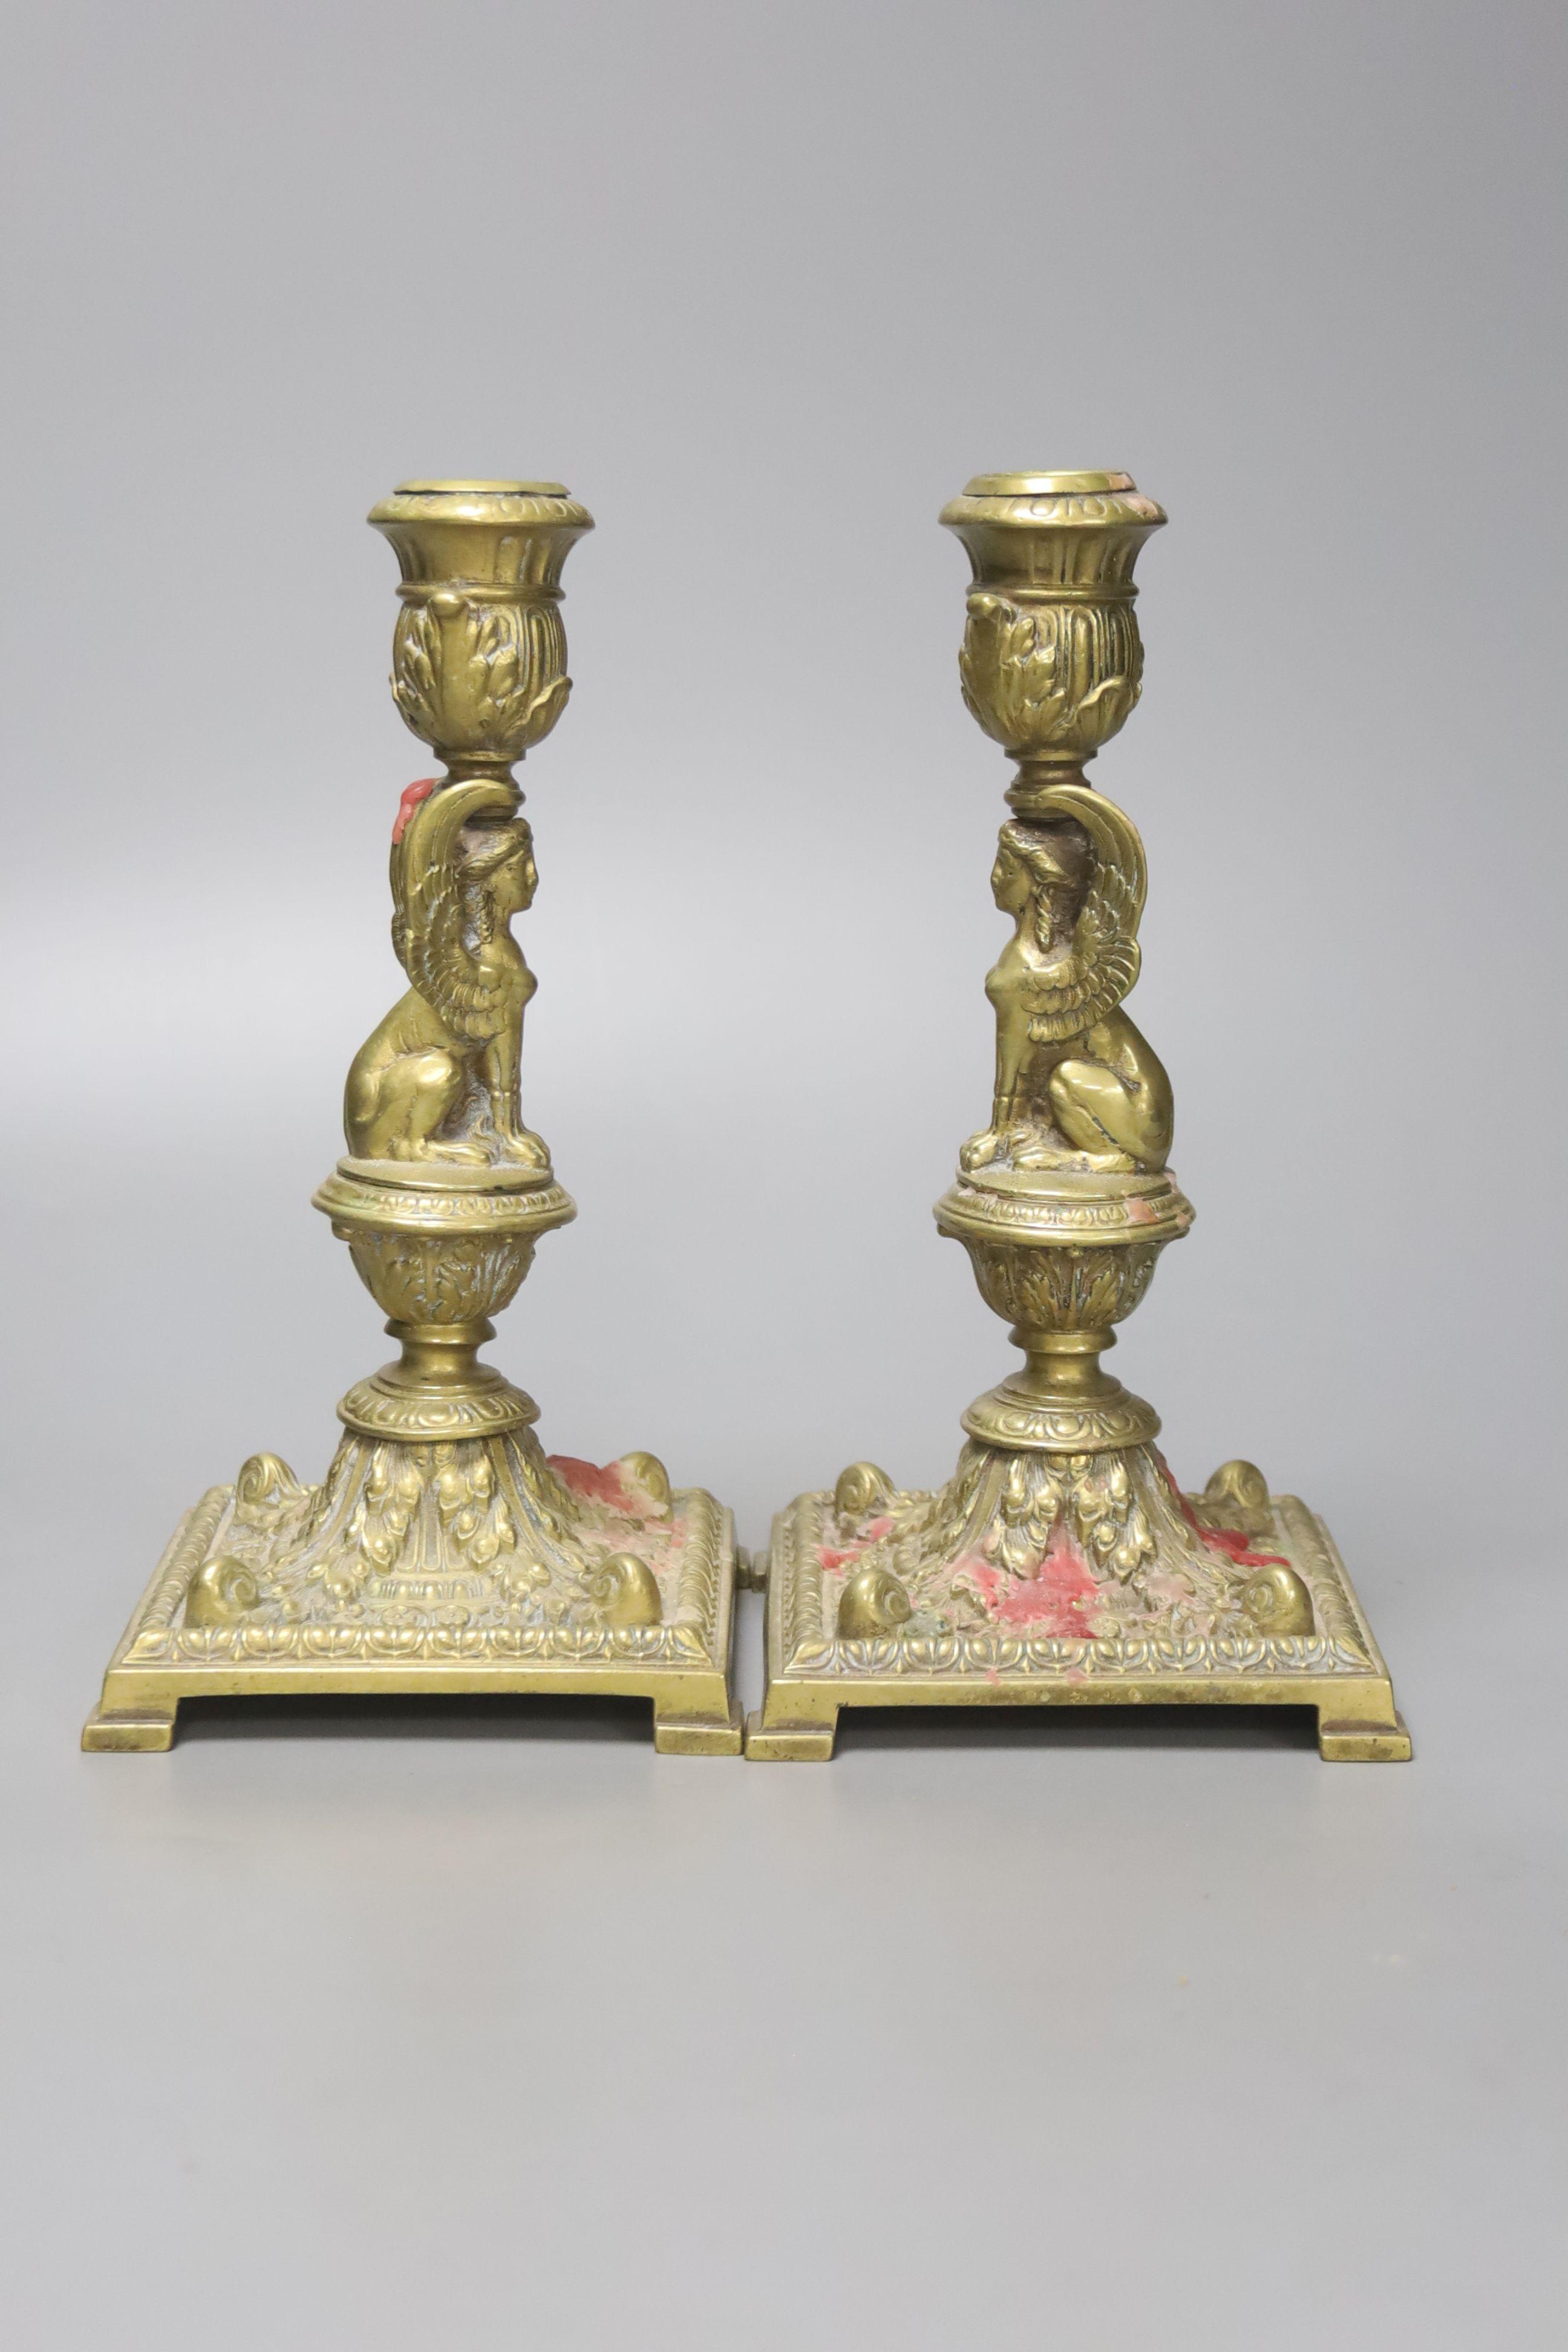 A pair of Victorian cast brass candlesticks, high 20cm - Image 2 of 3